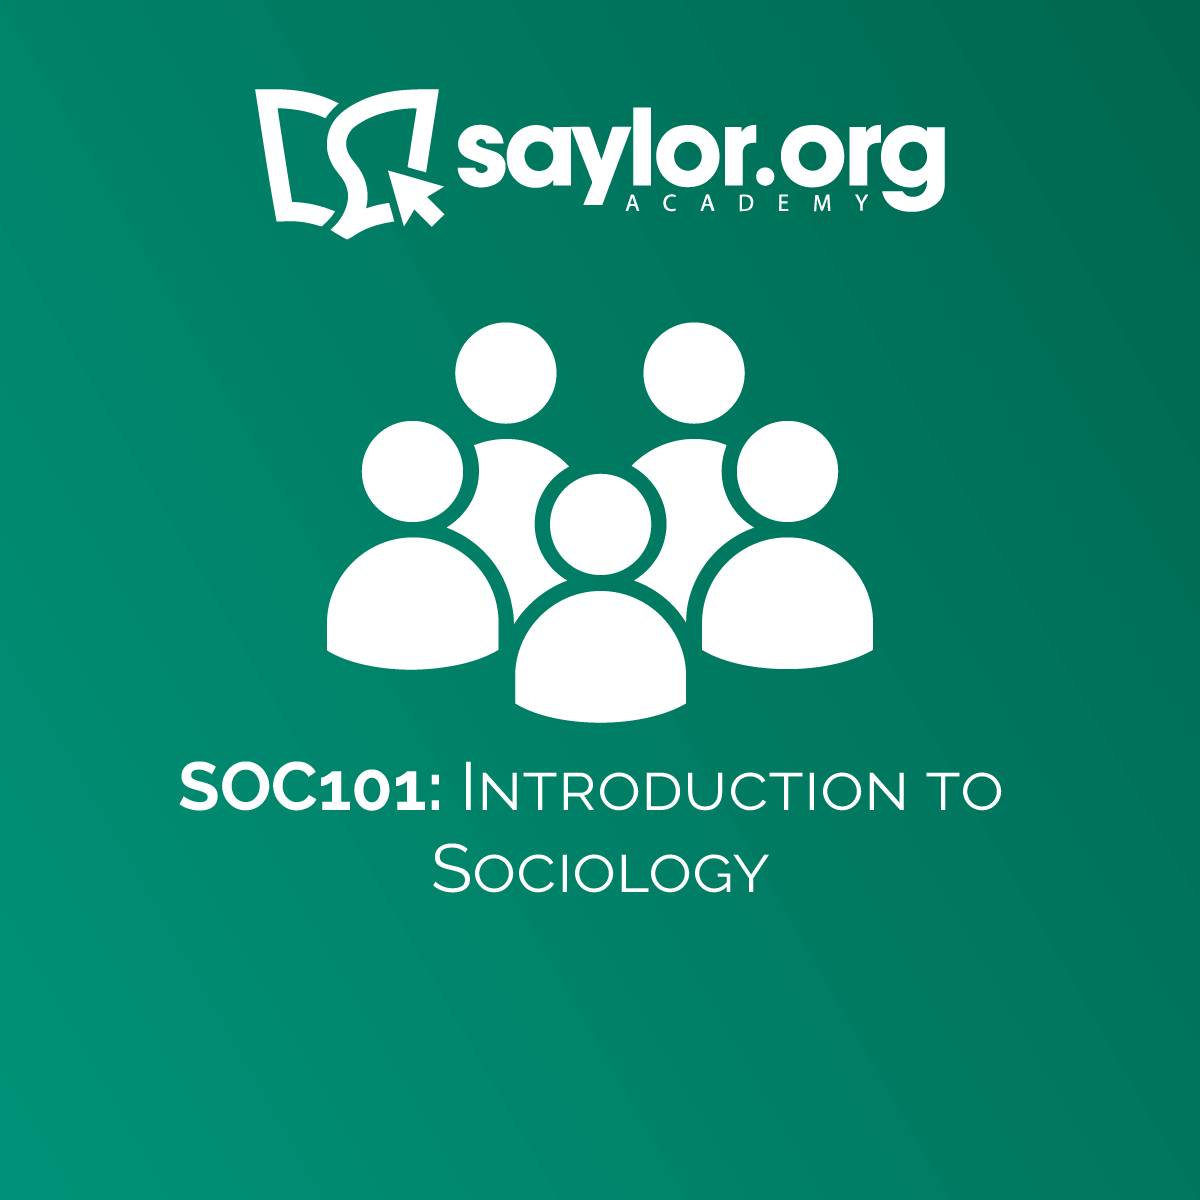 SOC101: Introduction to Sociology | Saylor Academy